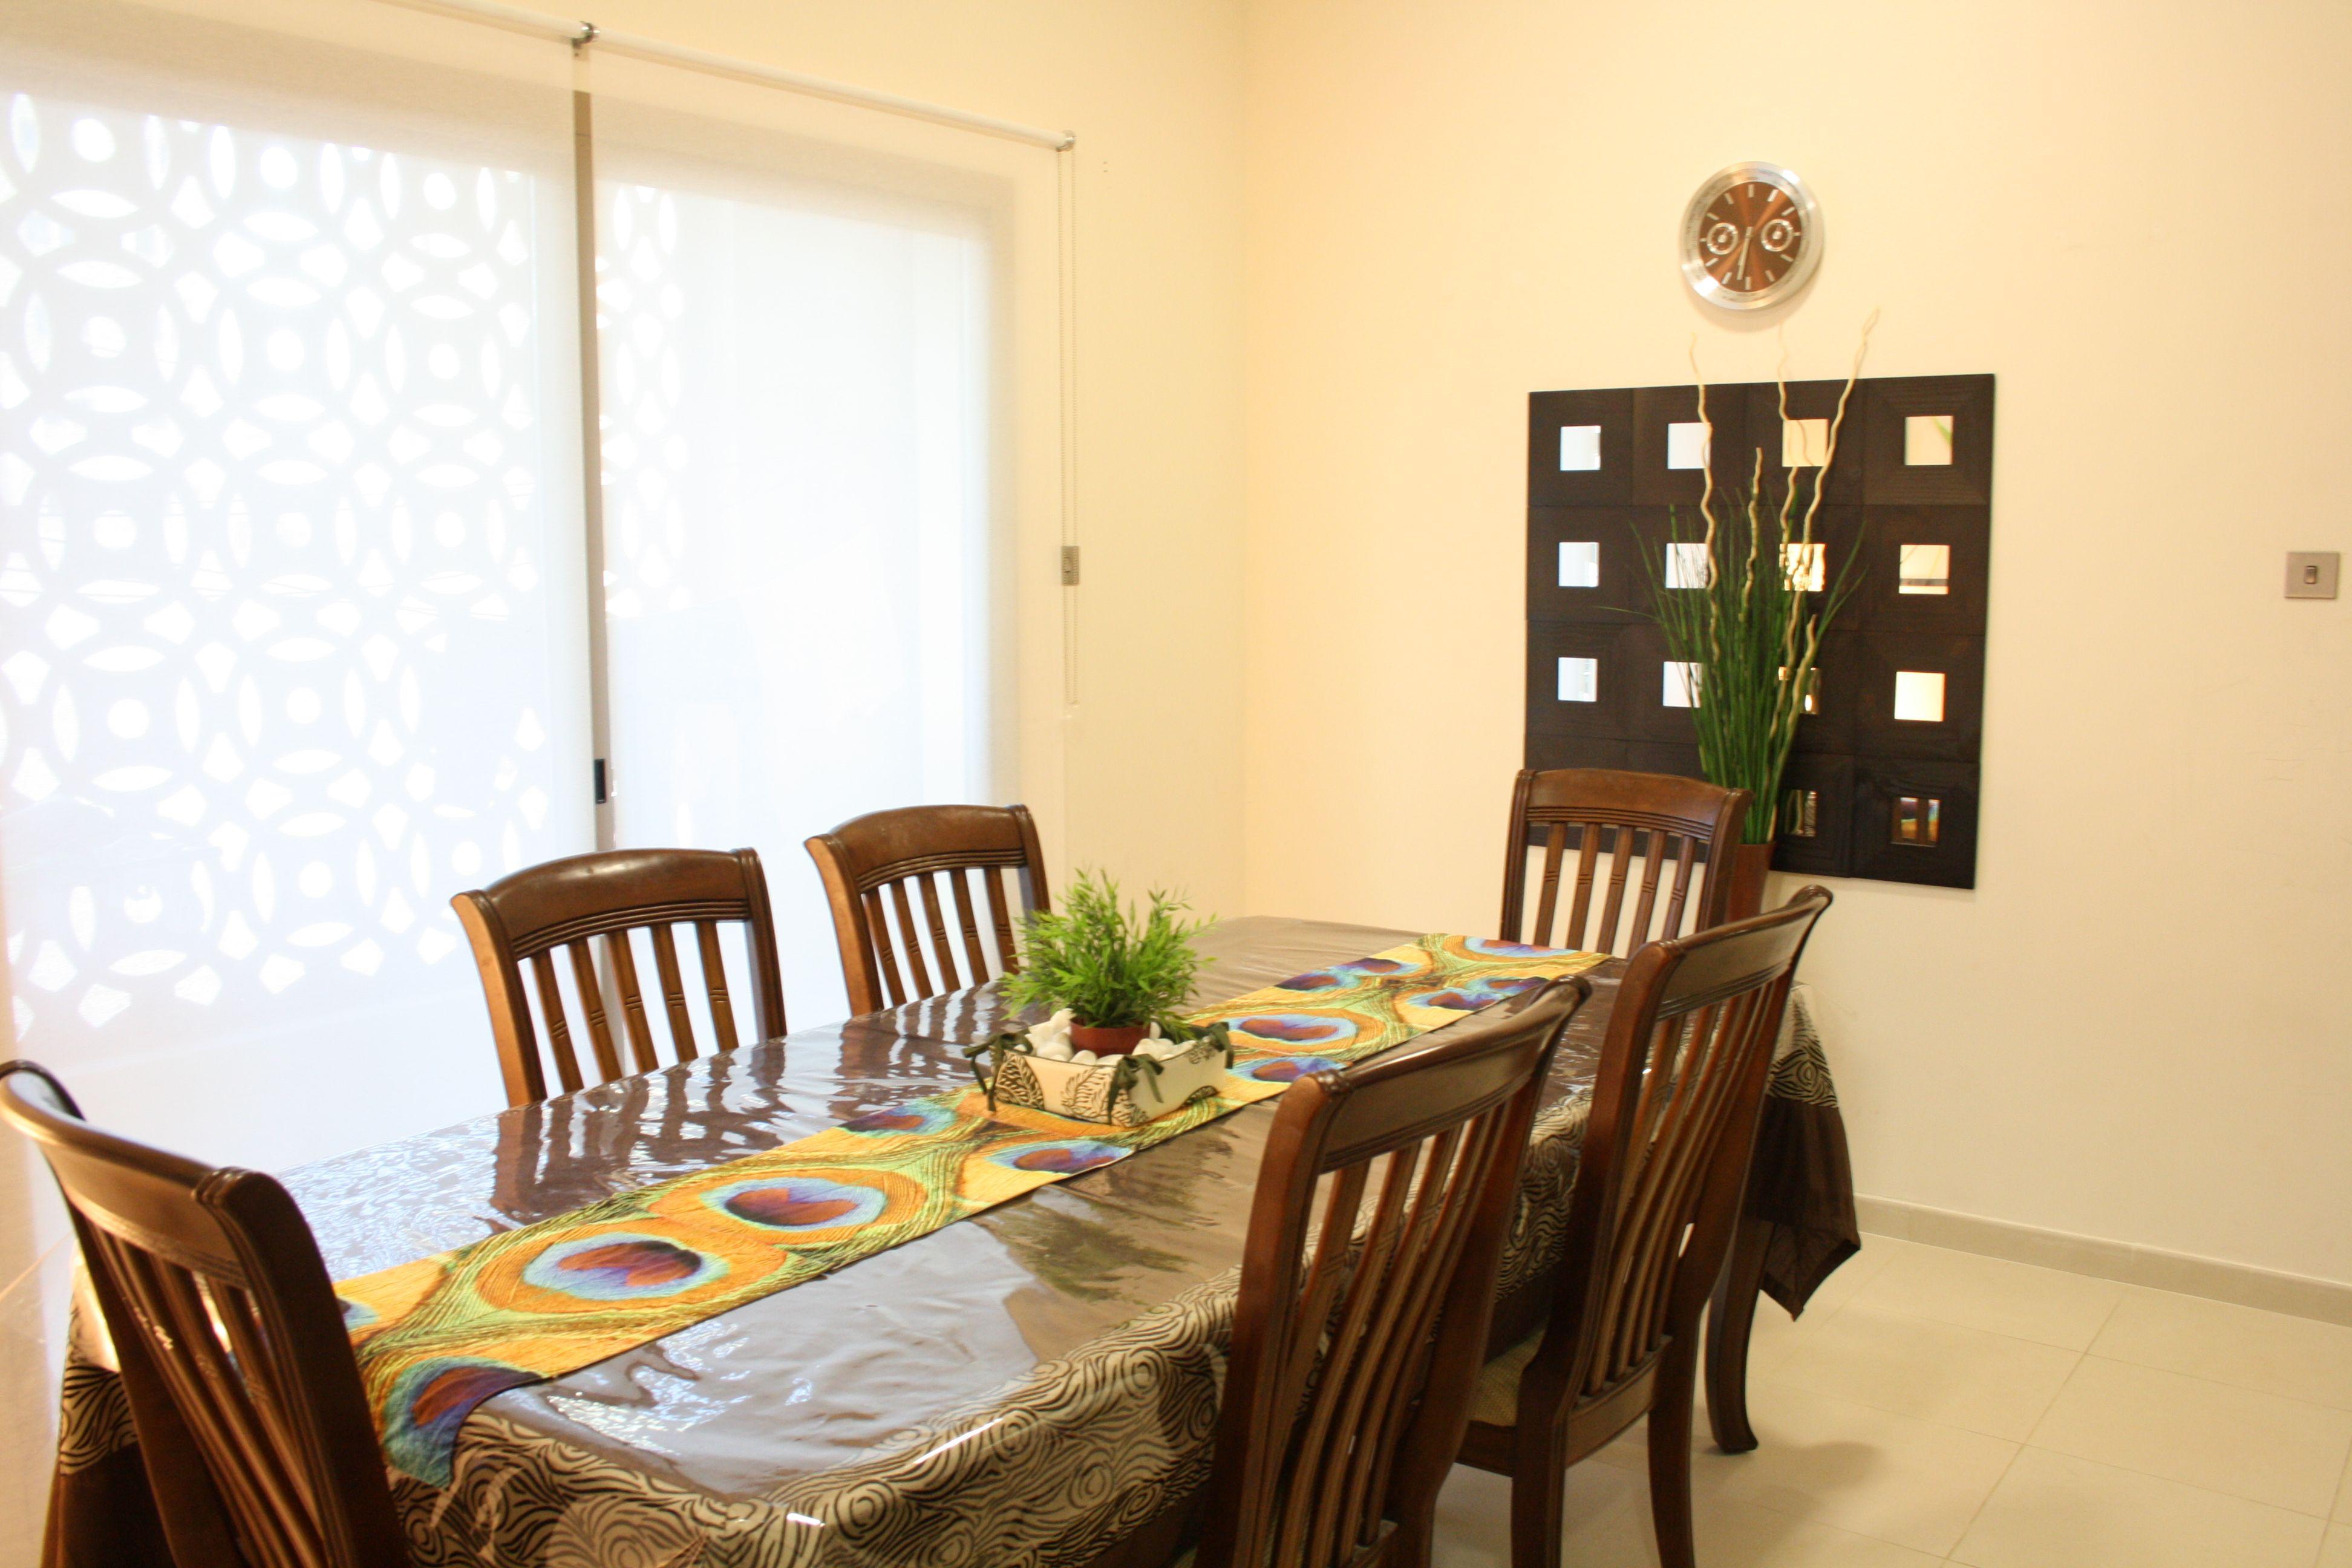 Dining room Decor Idea.